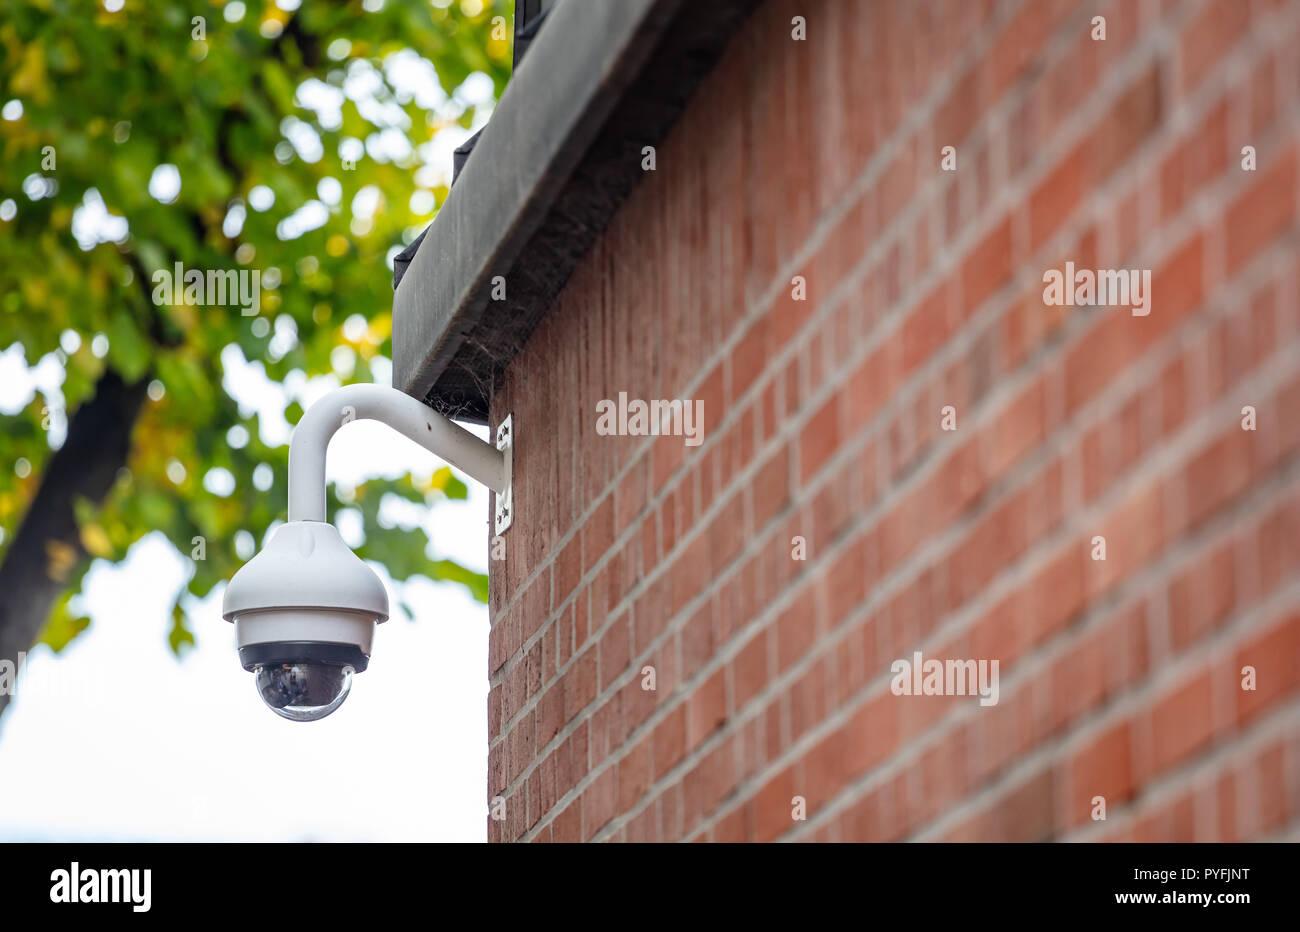 Security concept. Surveillance CCTV Camera on a brick wall, closeup view - Stock Image